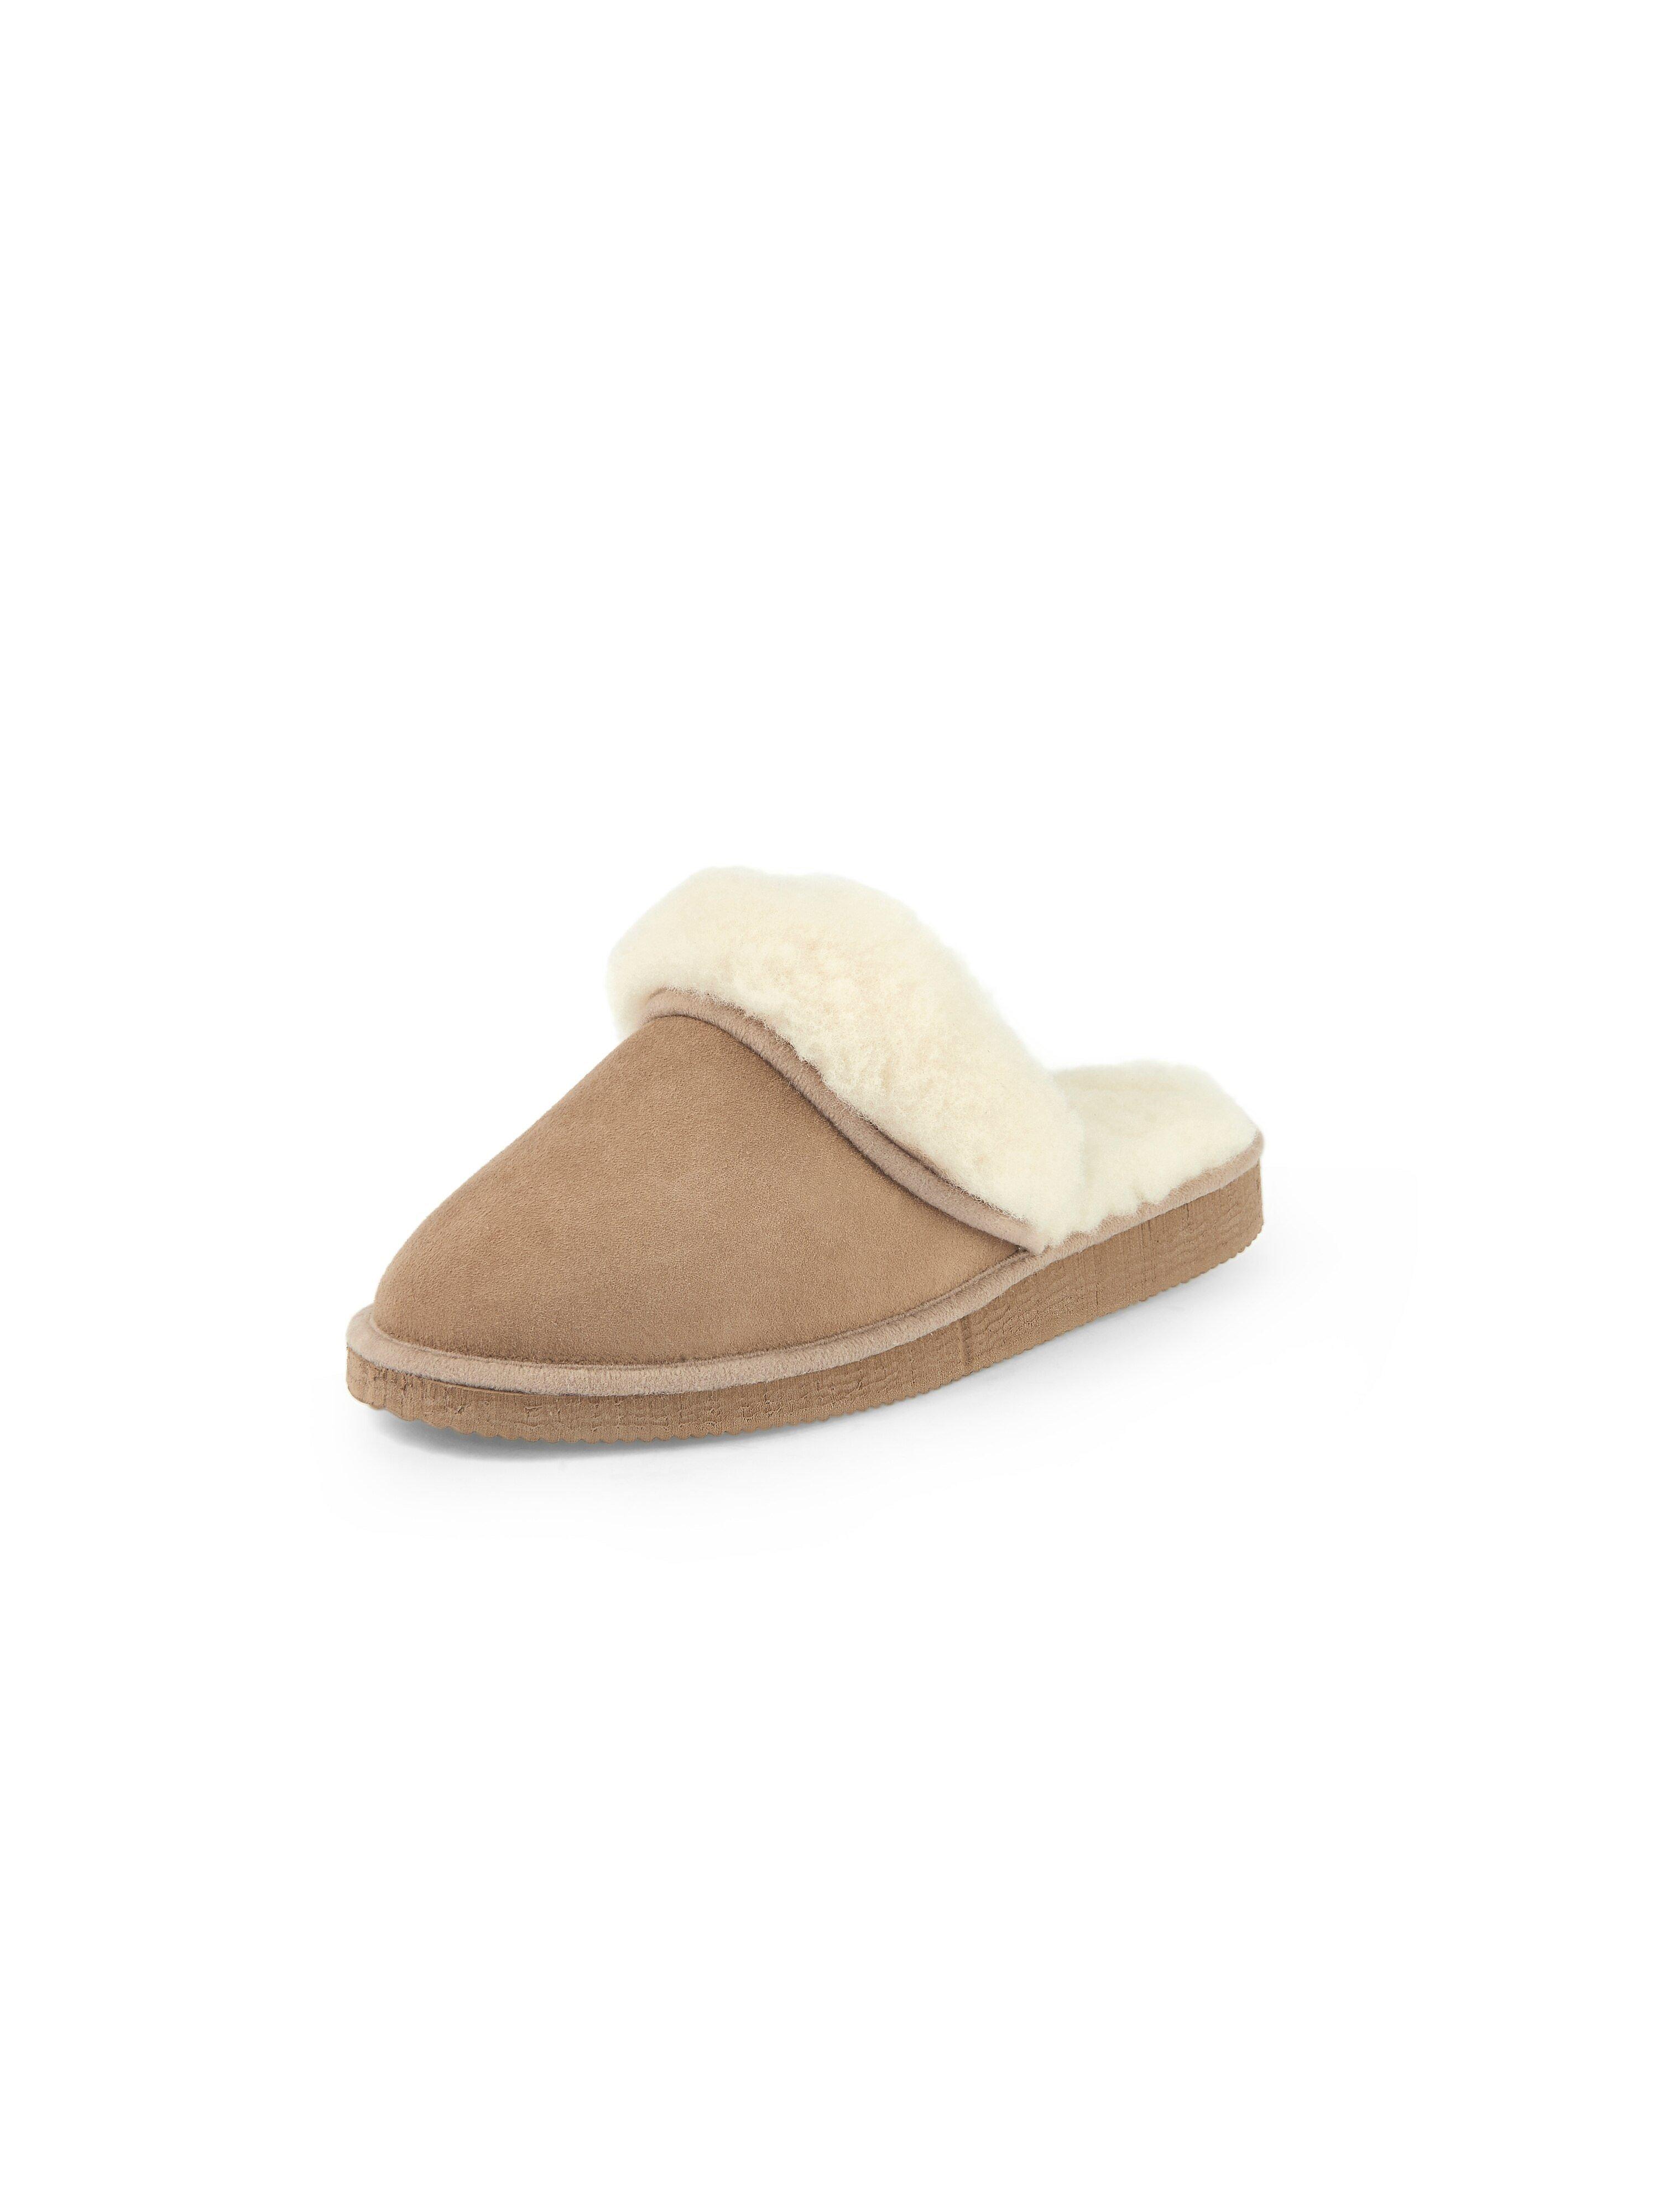 Pantoffels model Pala Van Kitzpichler beige